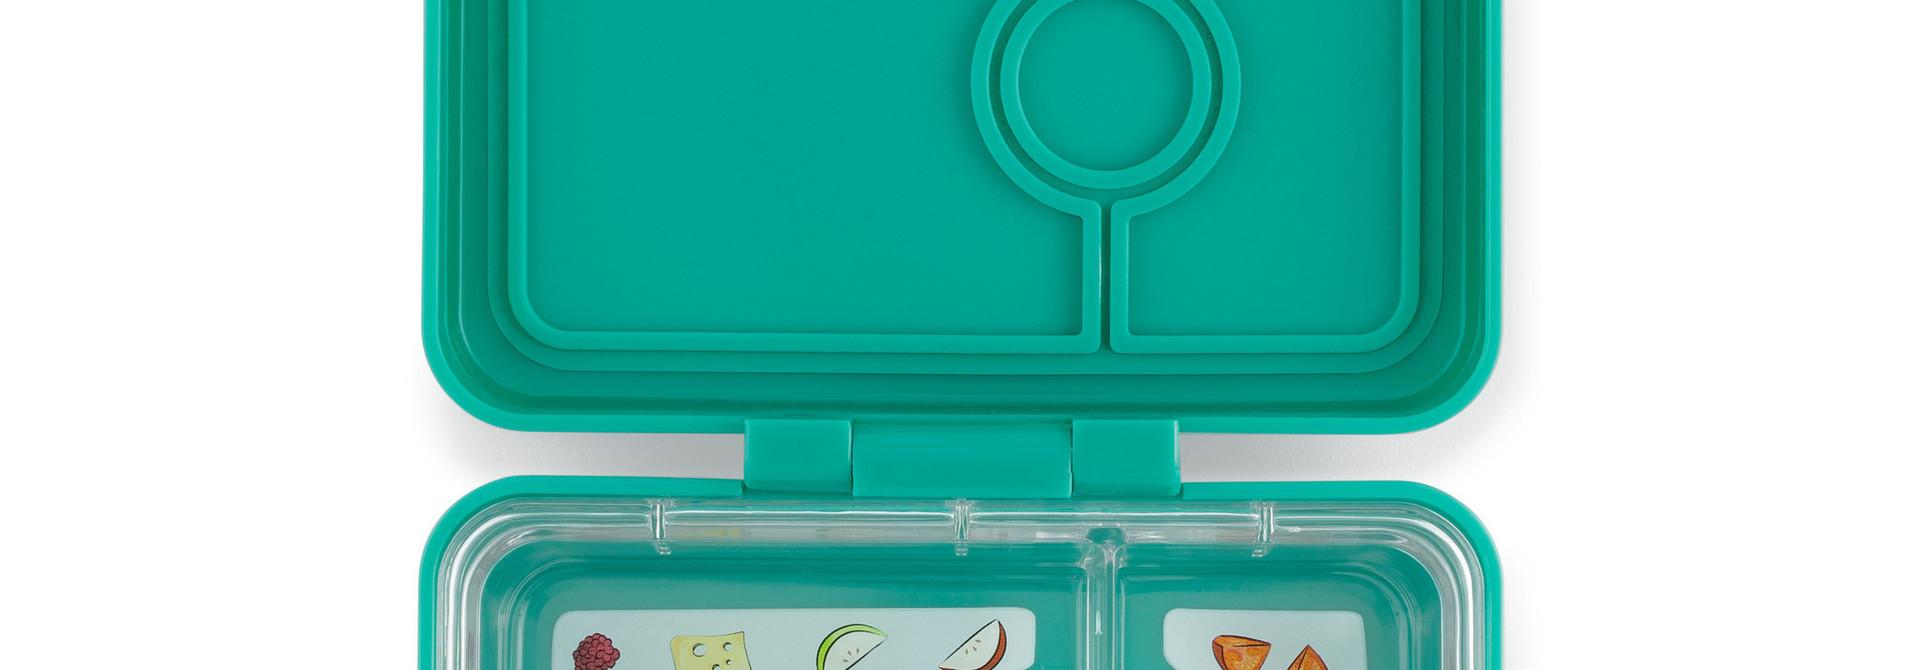 Yumbox MiniSnack broodtrommel 3 vakken, Kashmir blauw (aqua) / Toucan tray